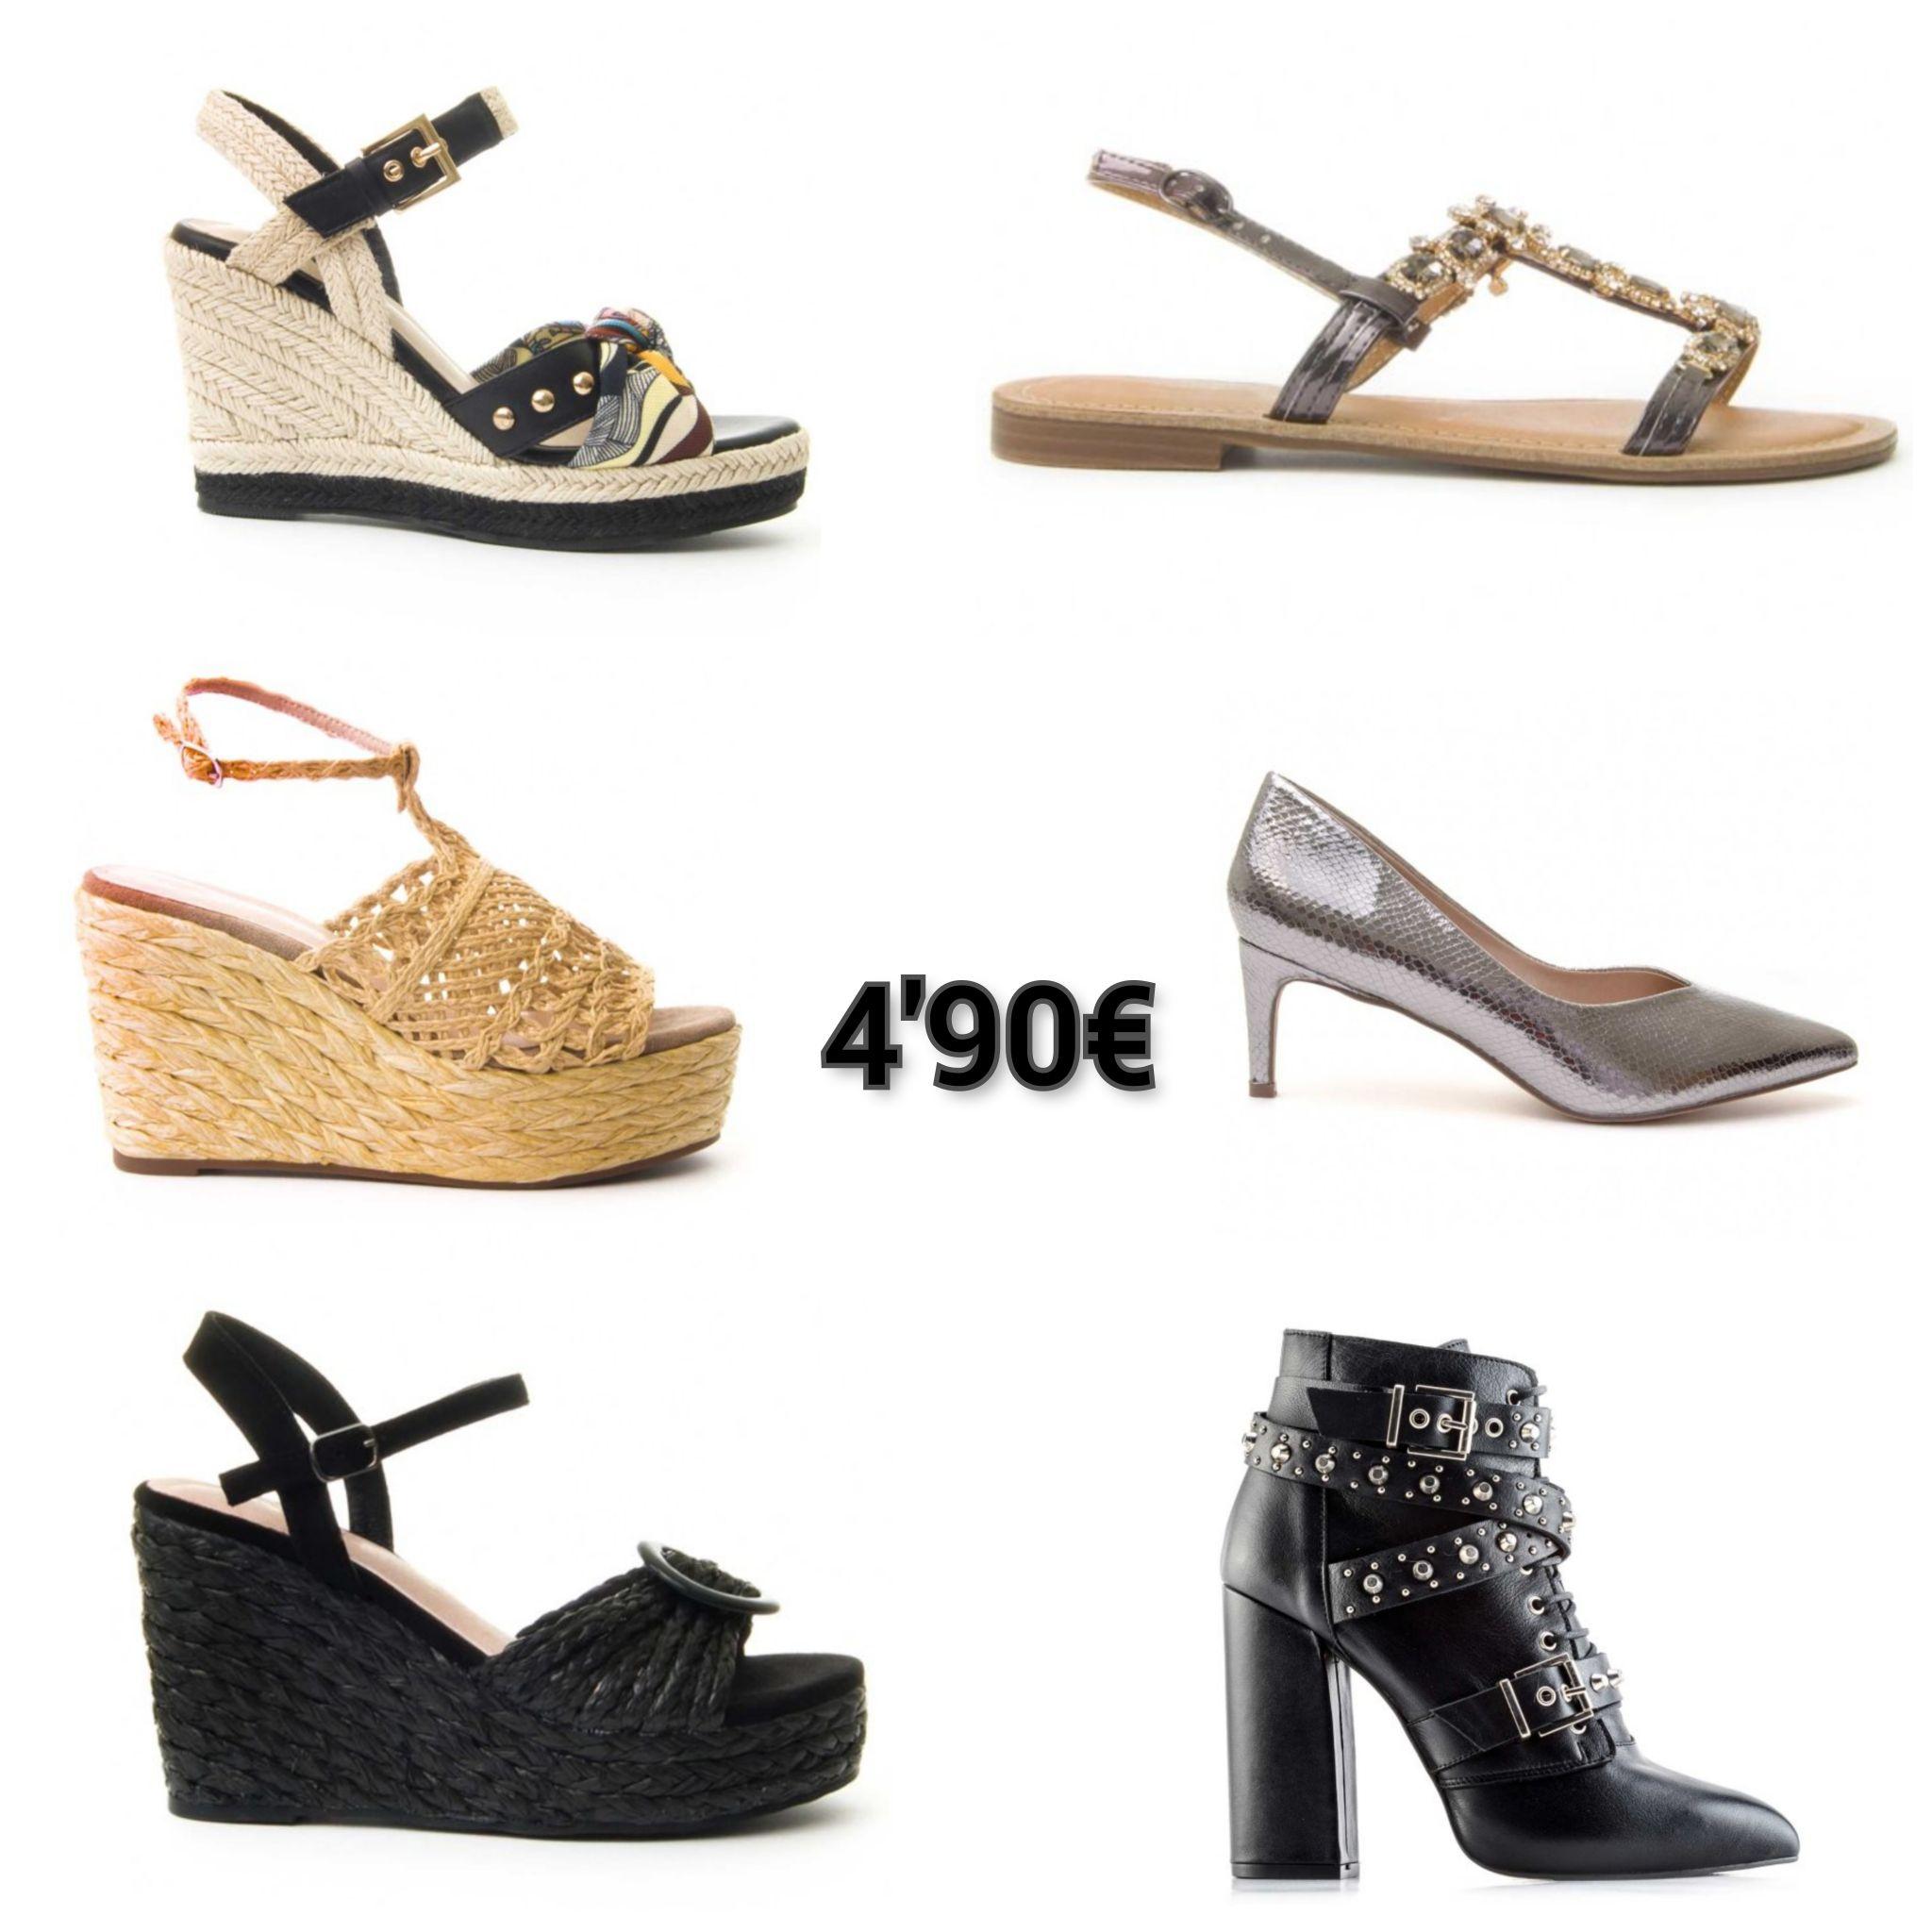 Recopilación de zapatos Montevita a 4,90€